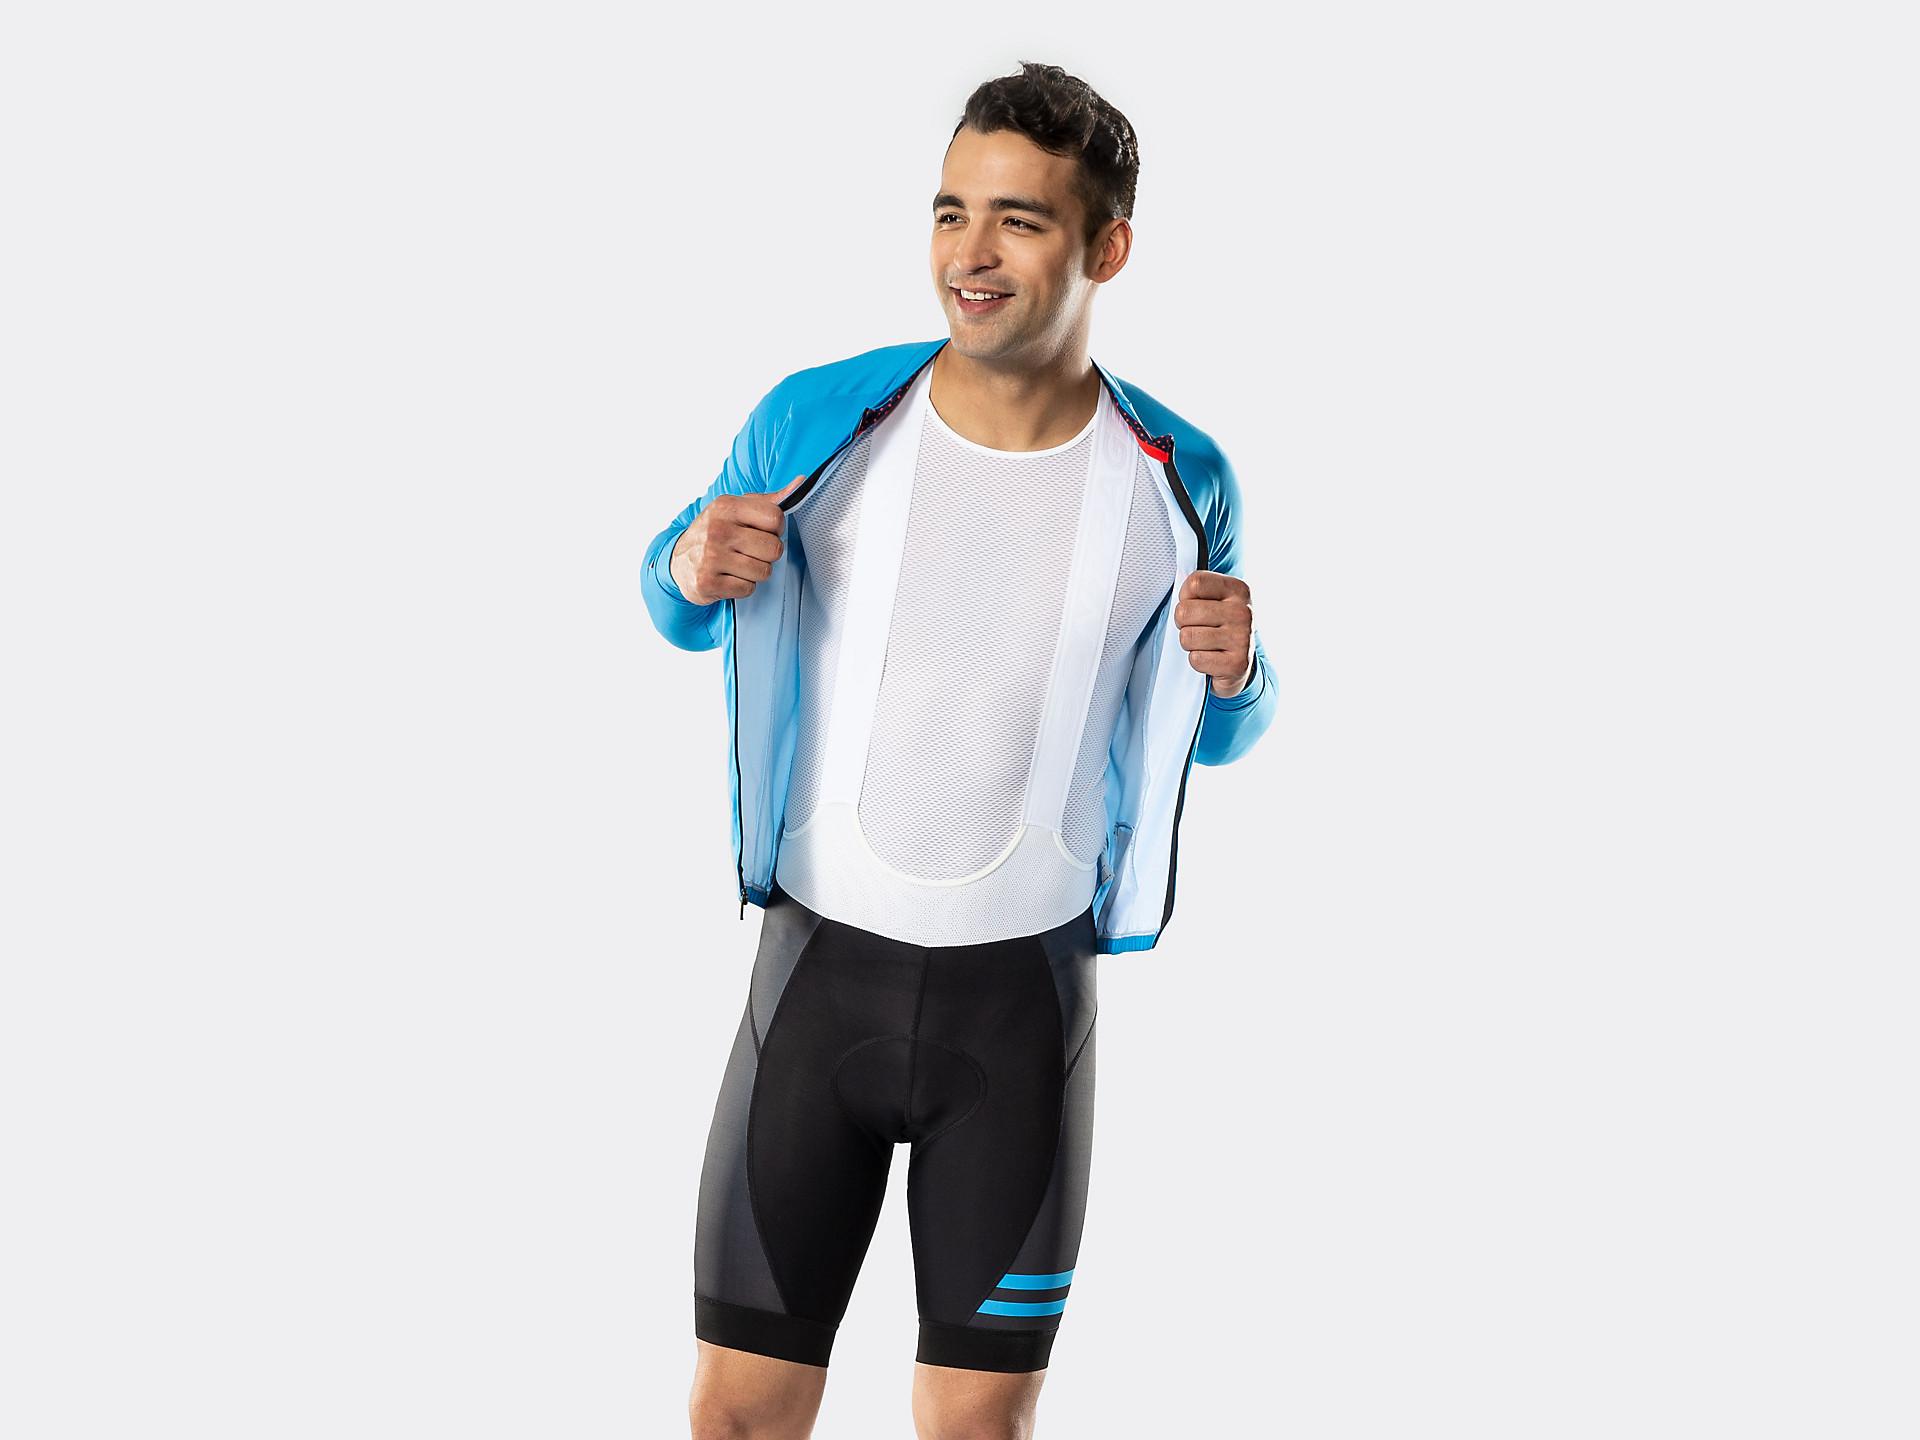 0fdf3a5c2c178 Bontrager Circuit LTD Bib Cycling Short. Overview  Features  Tech specs   Sizing   fit  Reviews  FAQs  Buy. Prev Next